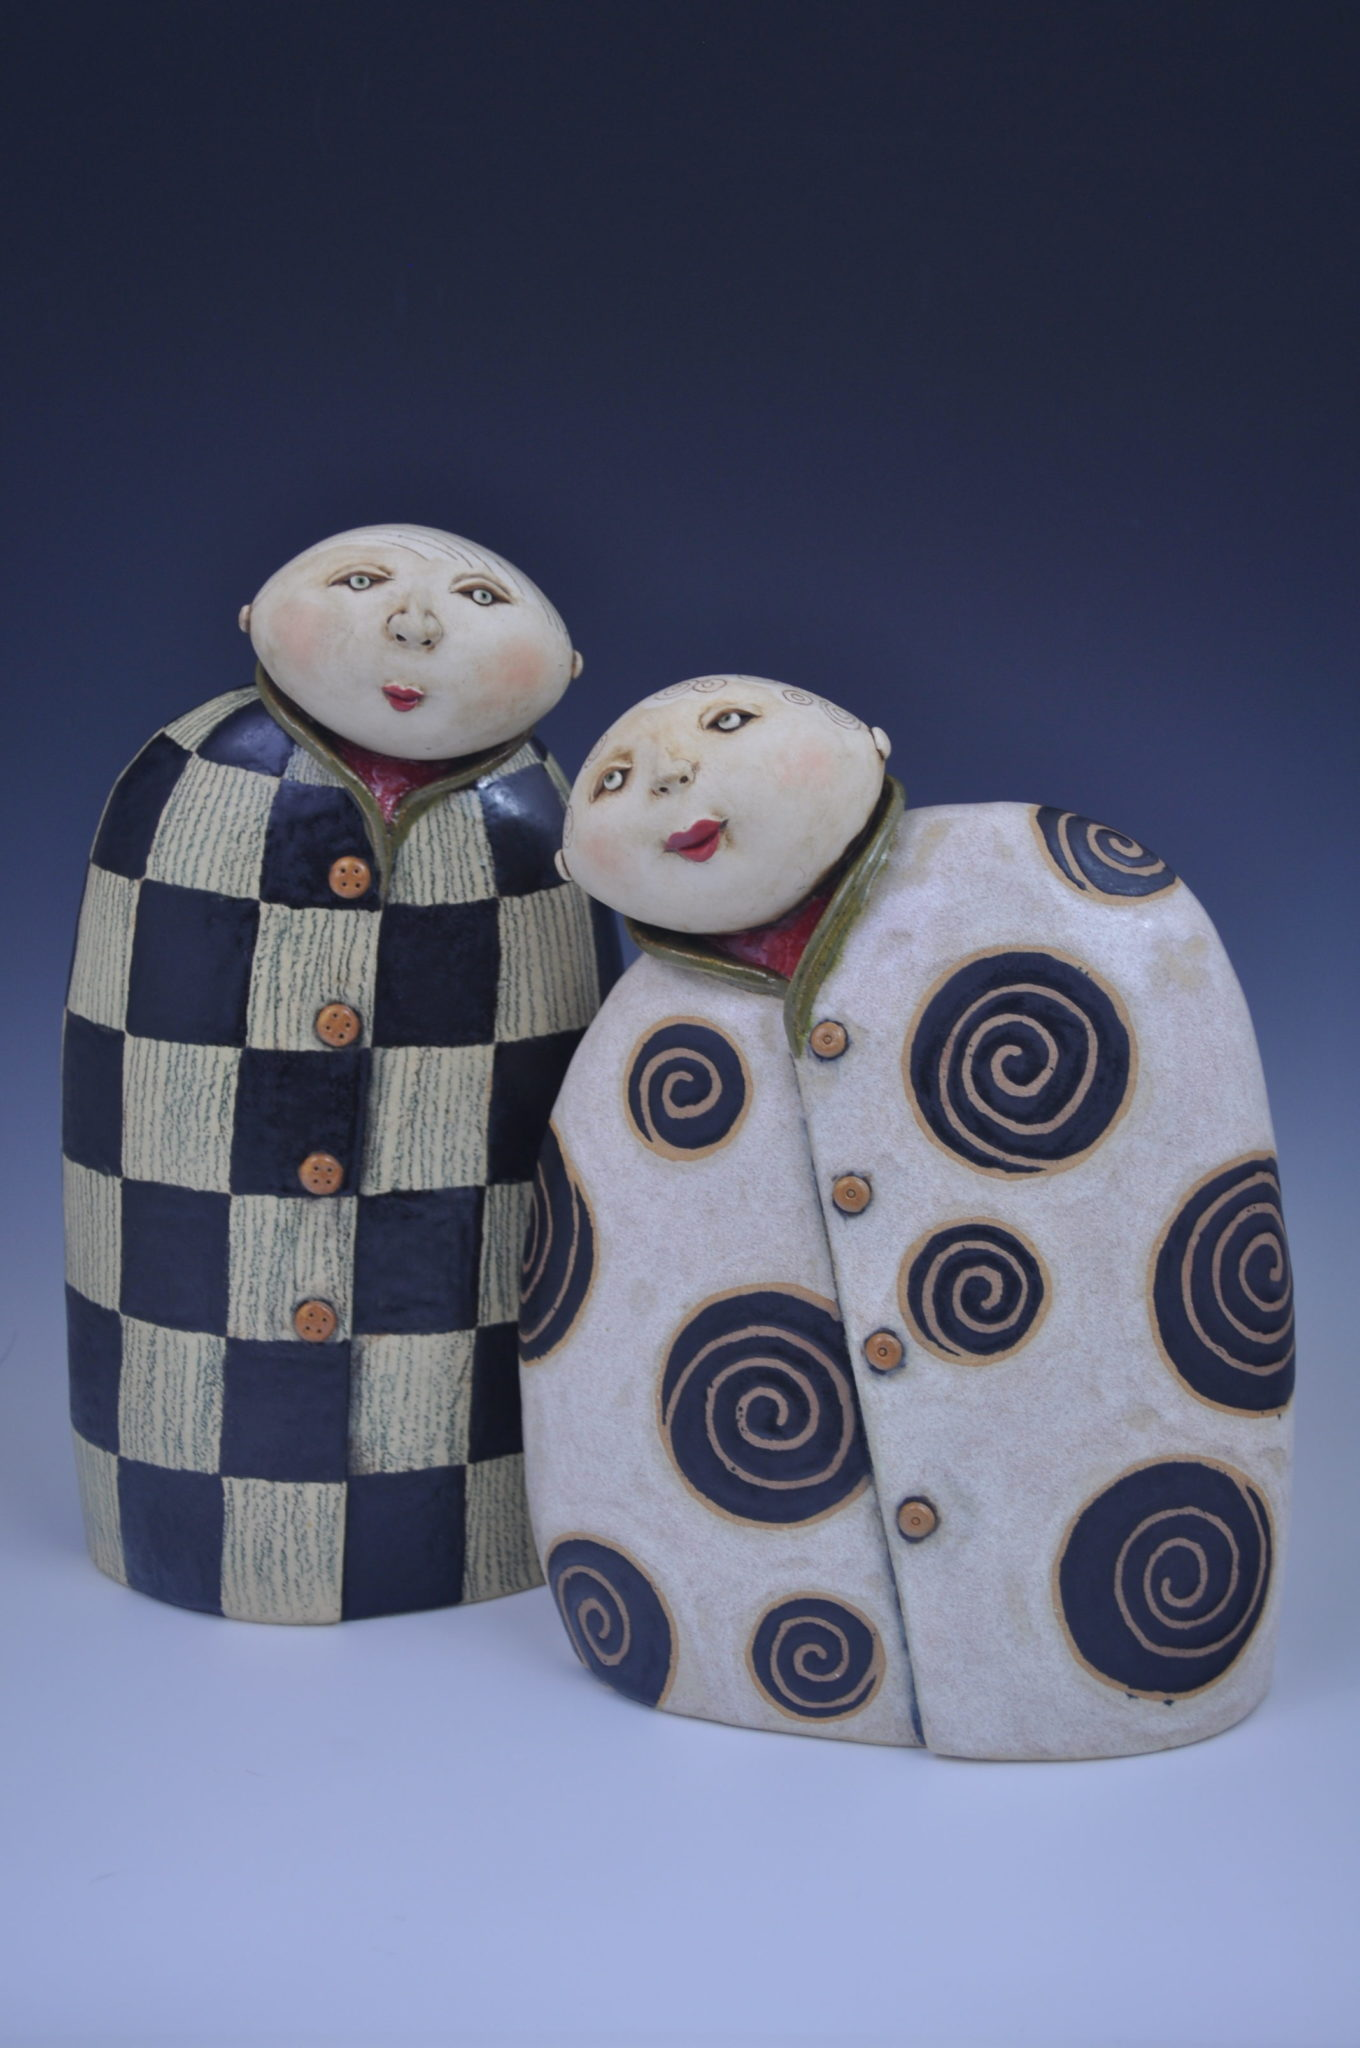 Anne Klocko - Mutt and Jeff